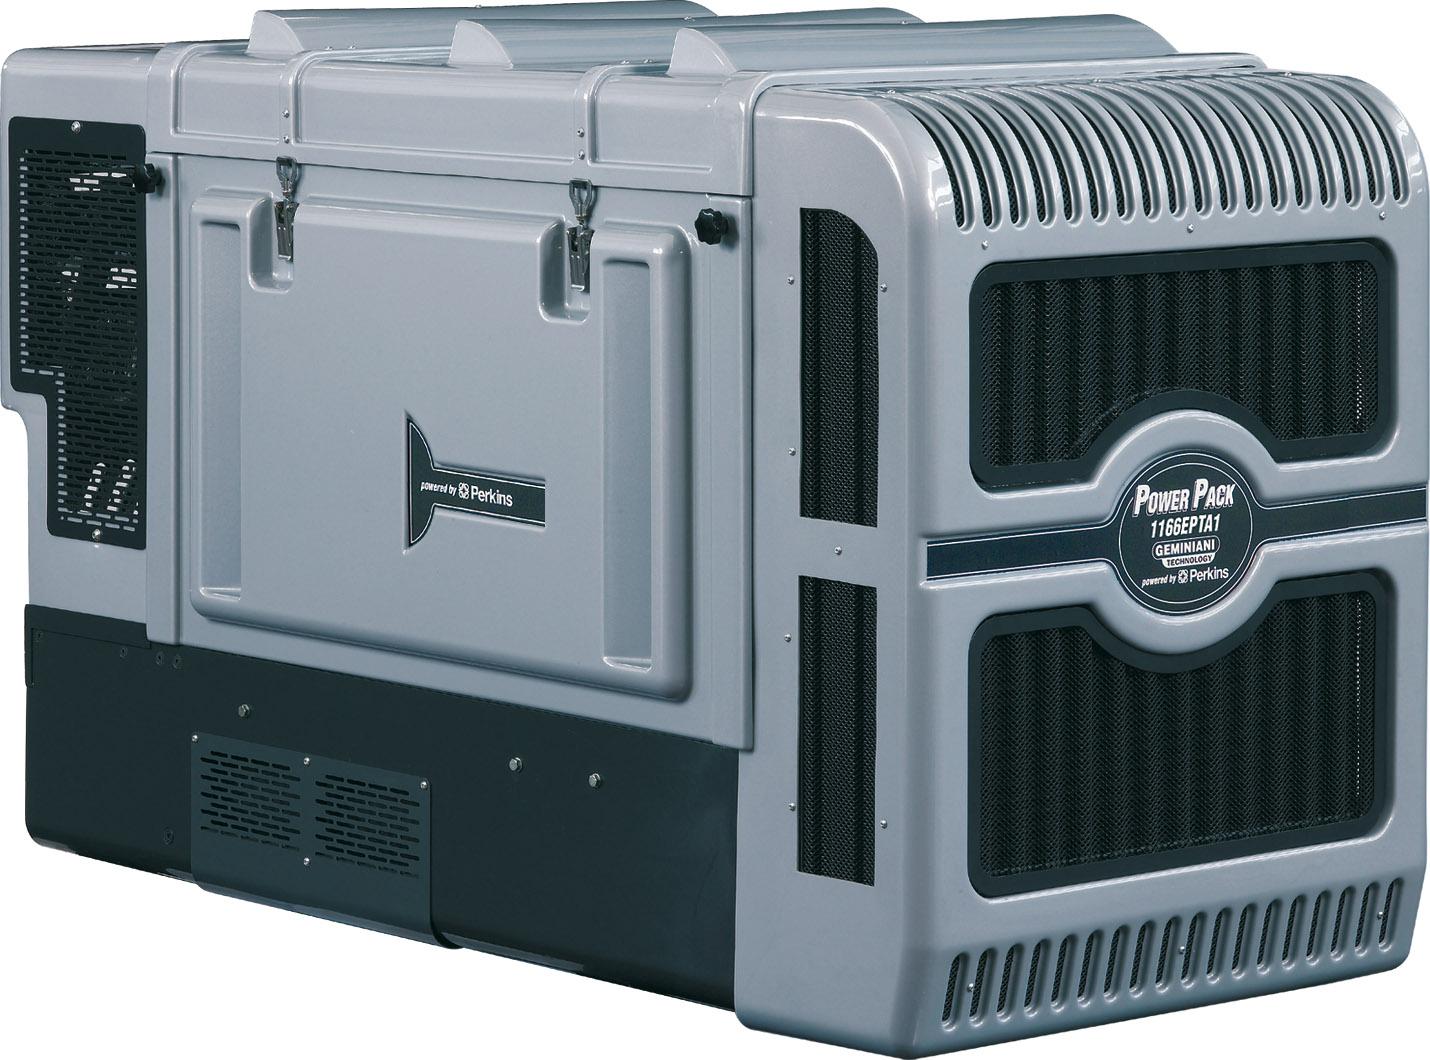 Power Pack 1166EPTA1